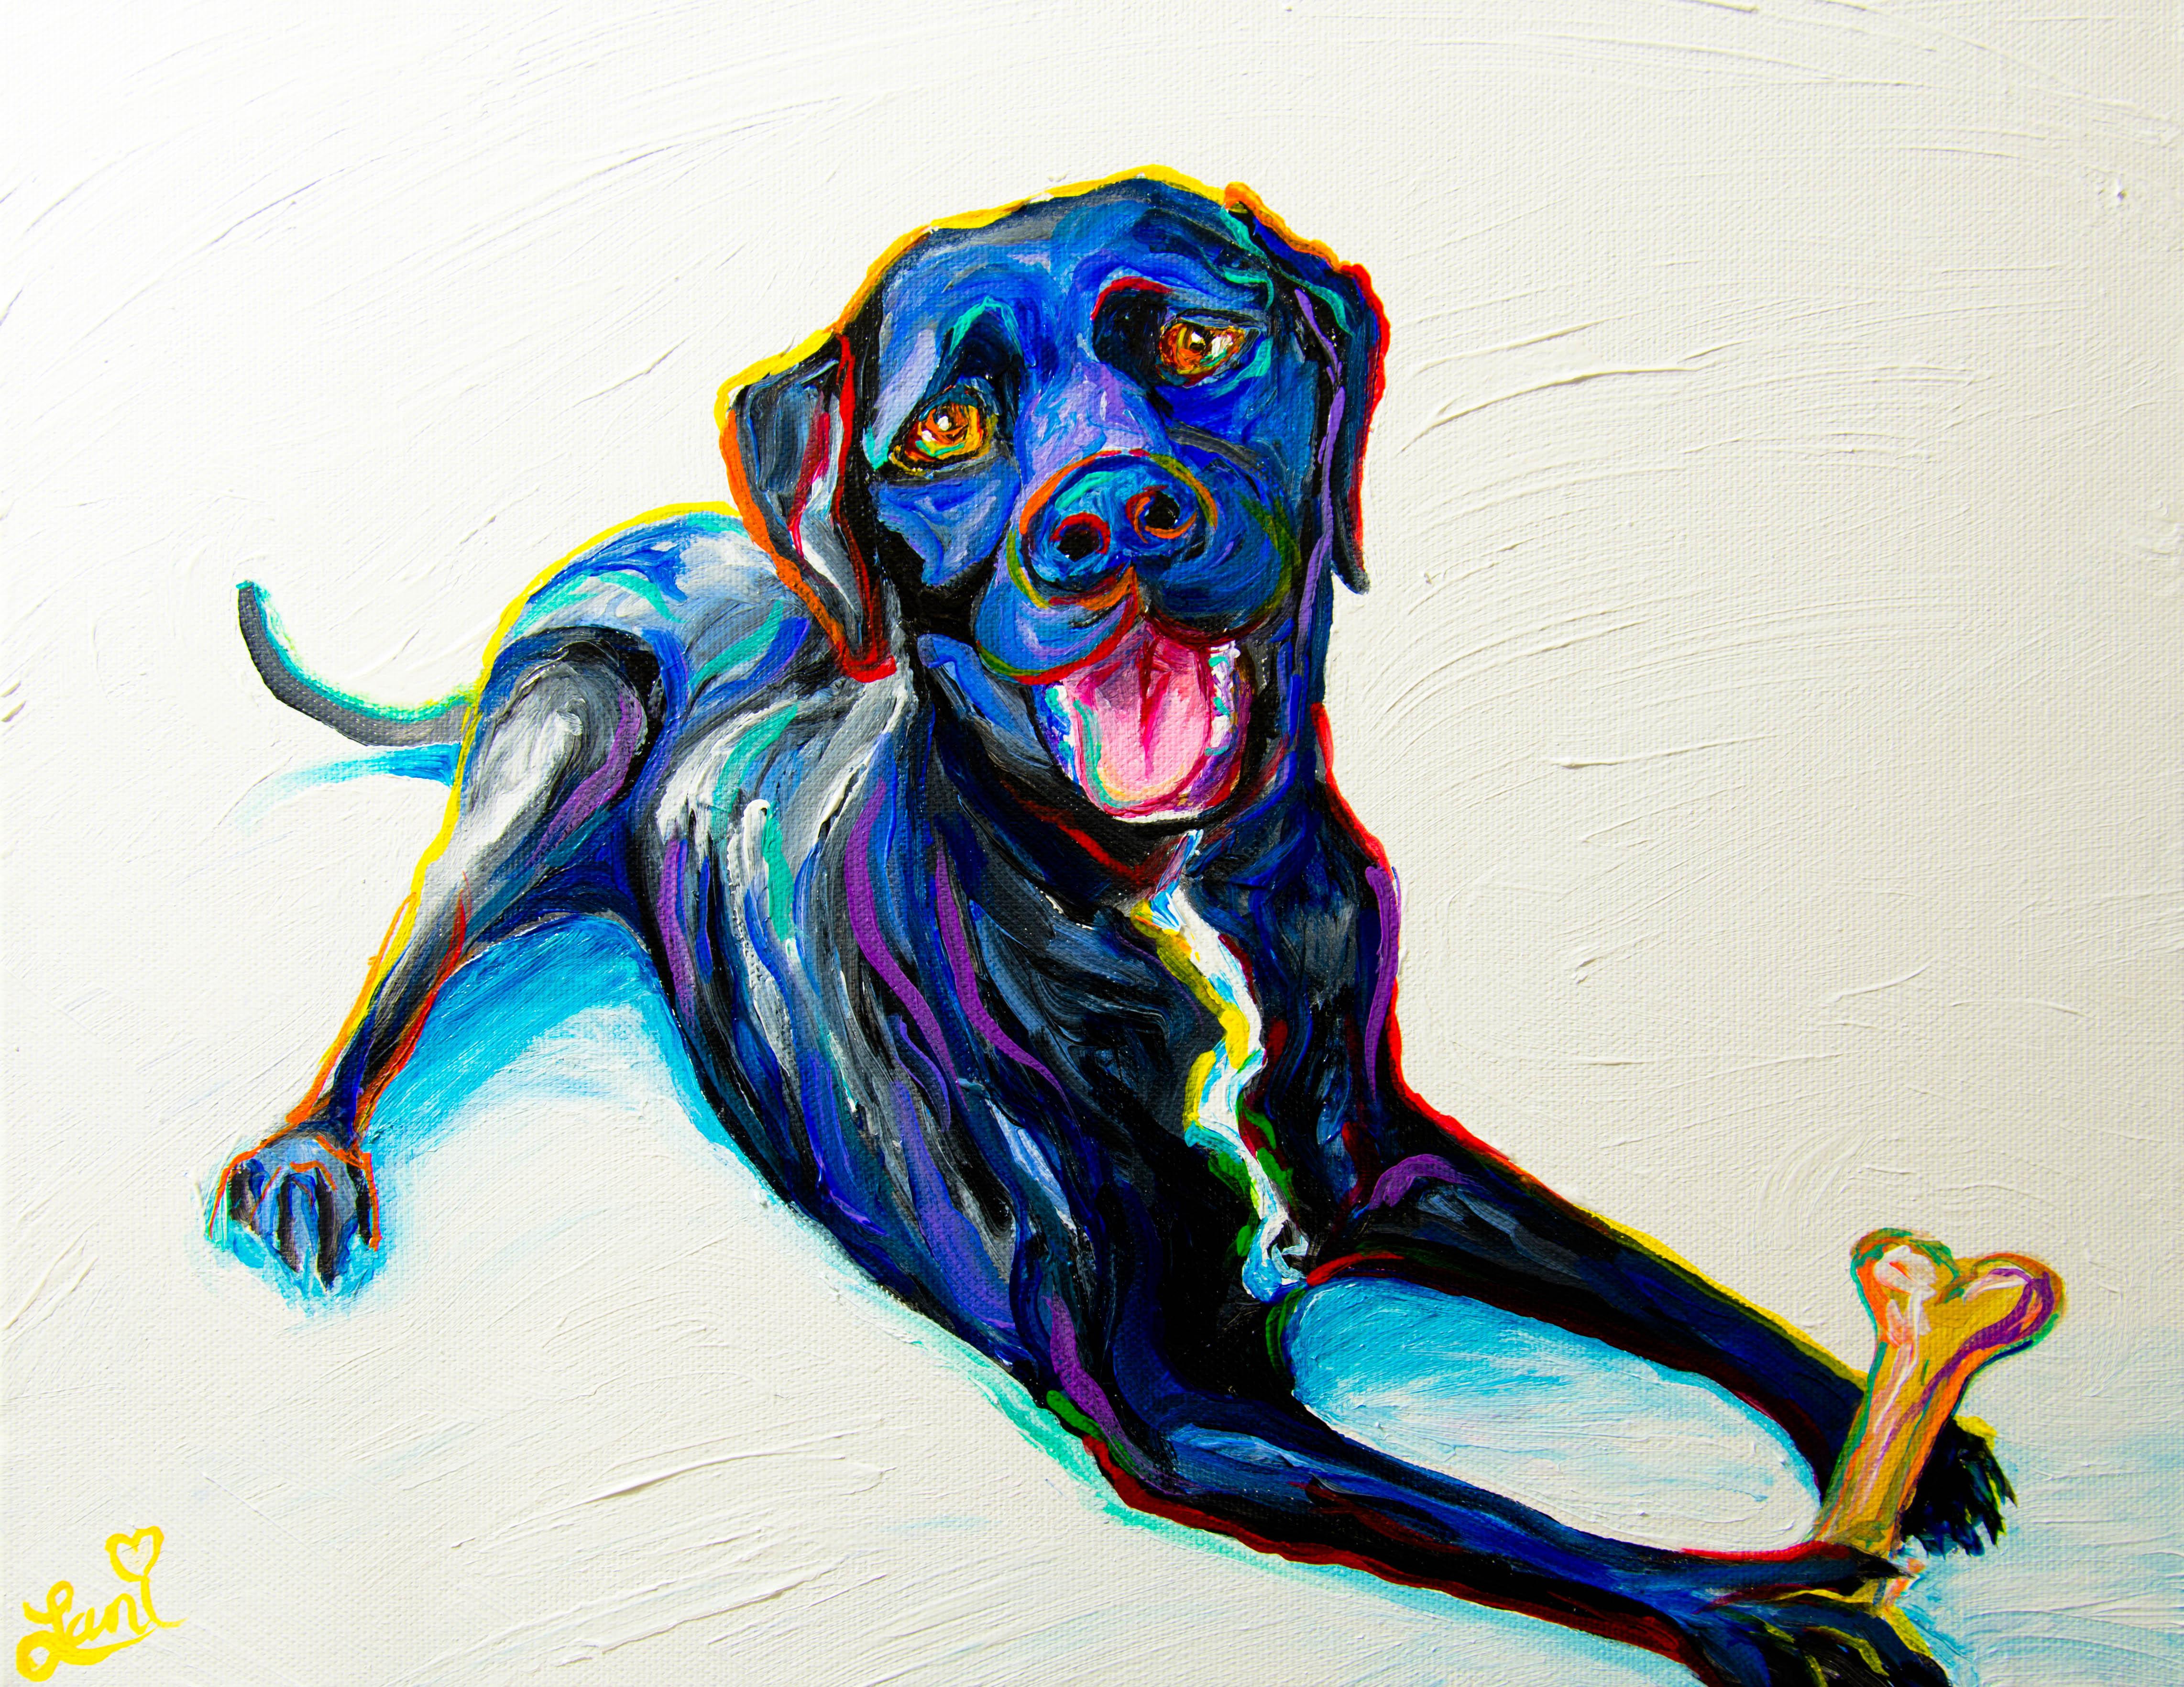 Monty 11x15 acrylic on canvas